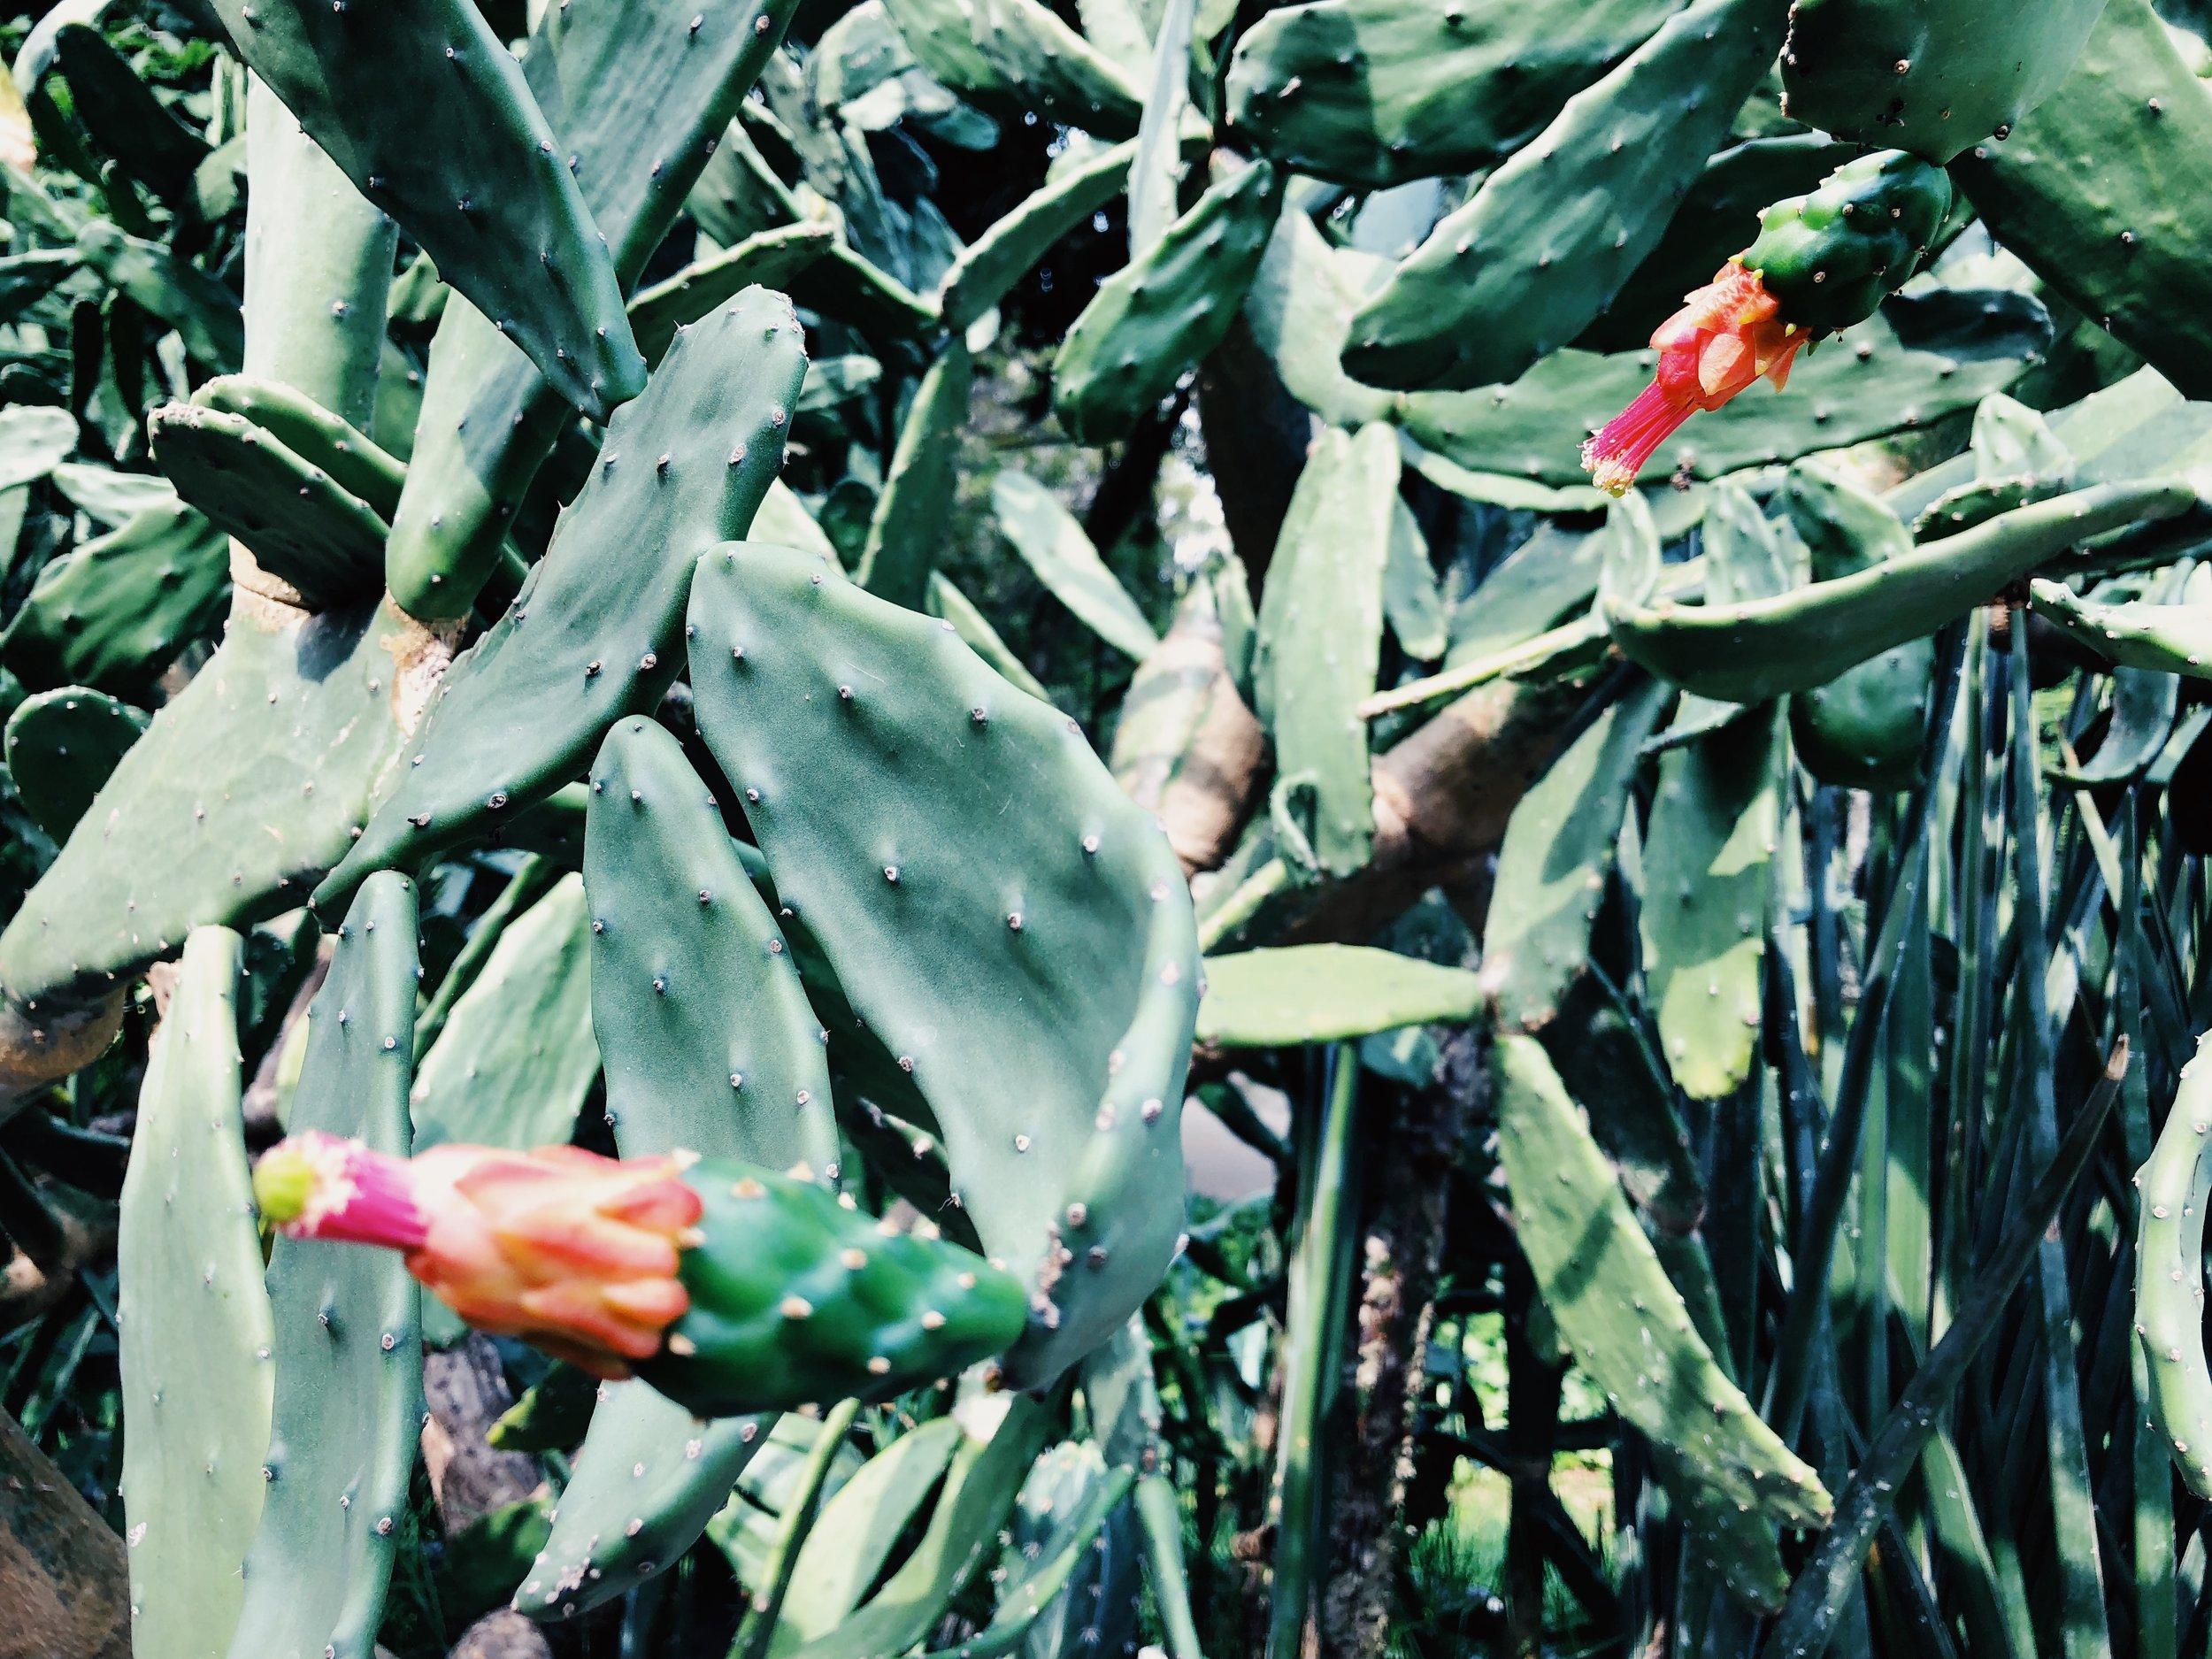 jardim botanico - rio de janeiro